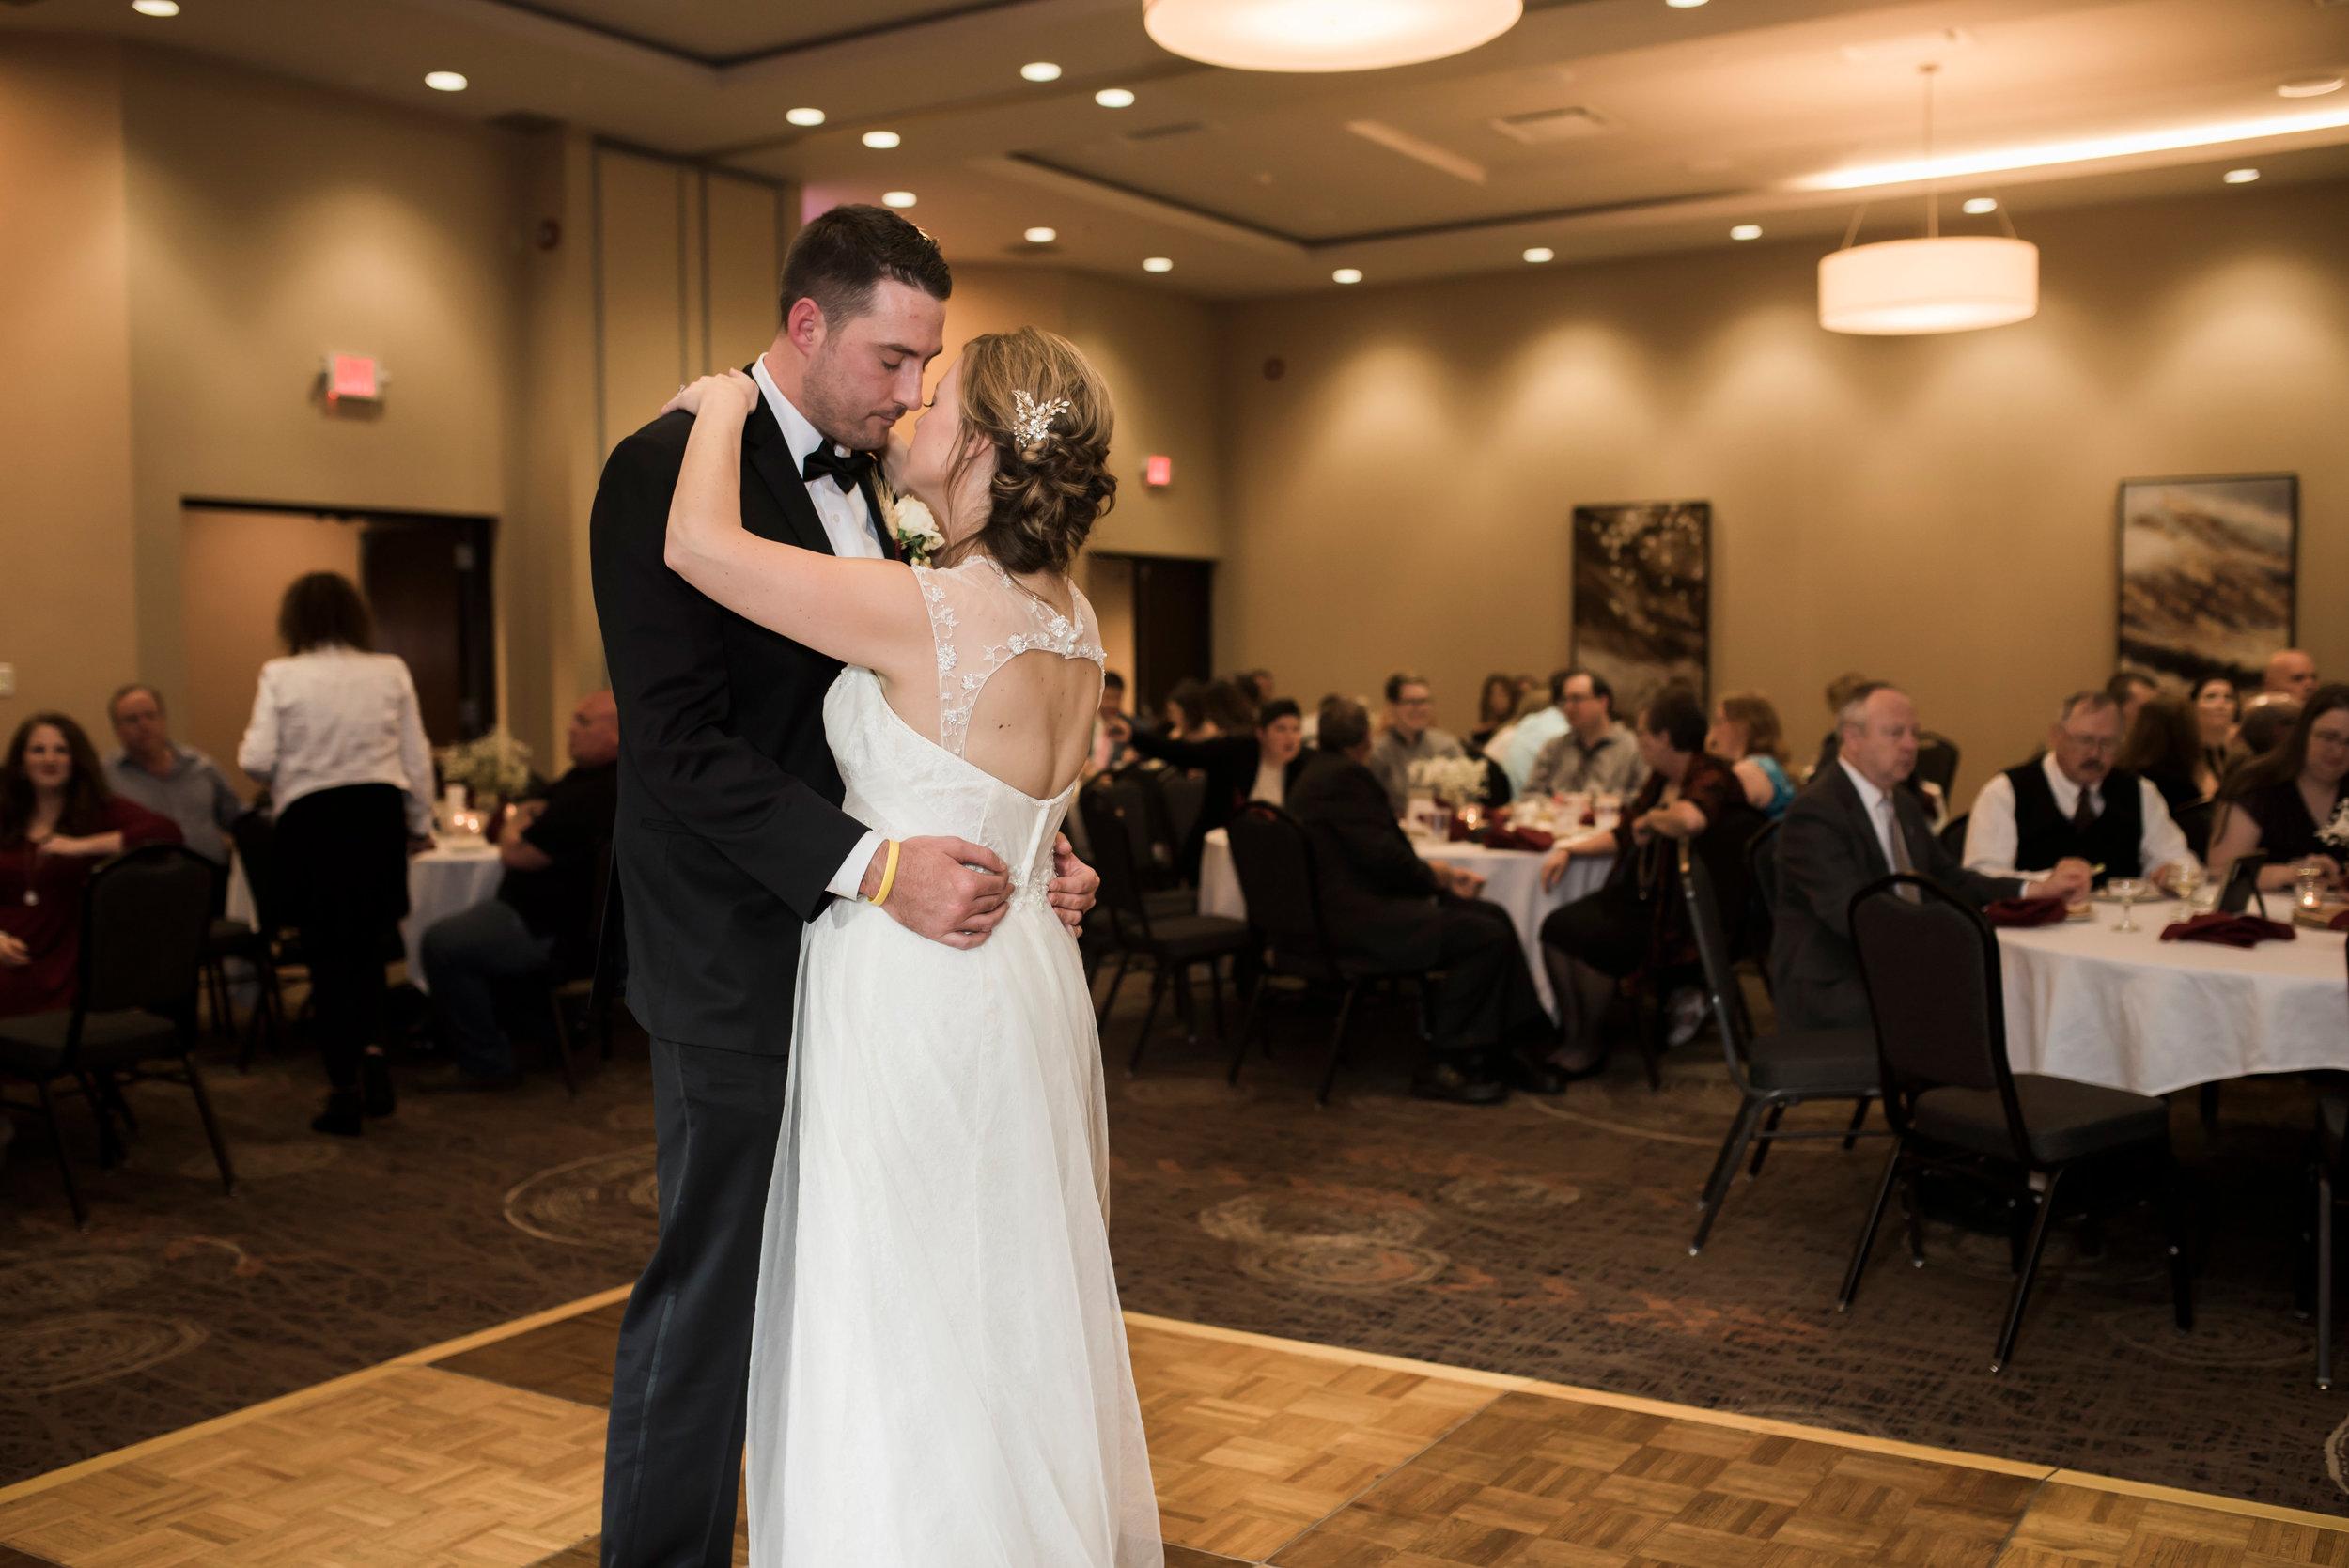 DoubleTree by Hilton wedding